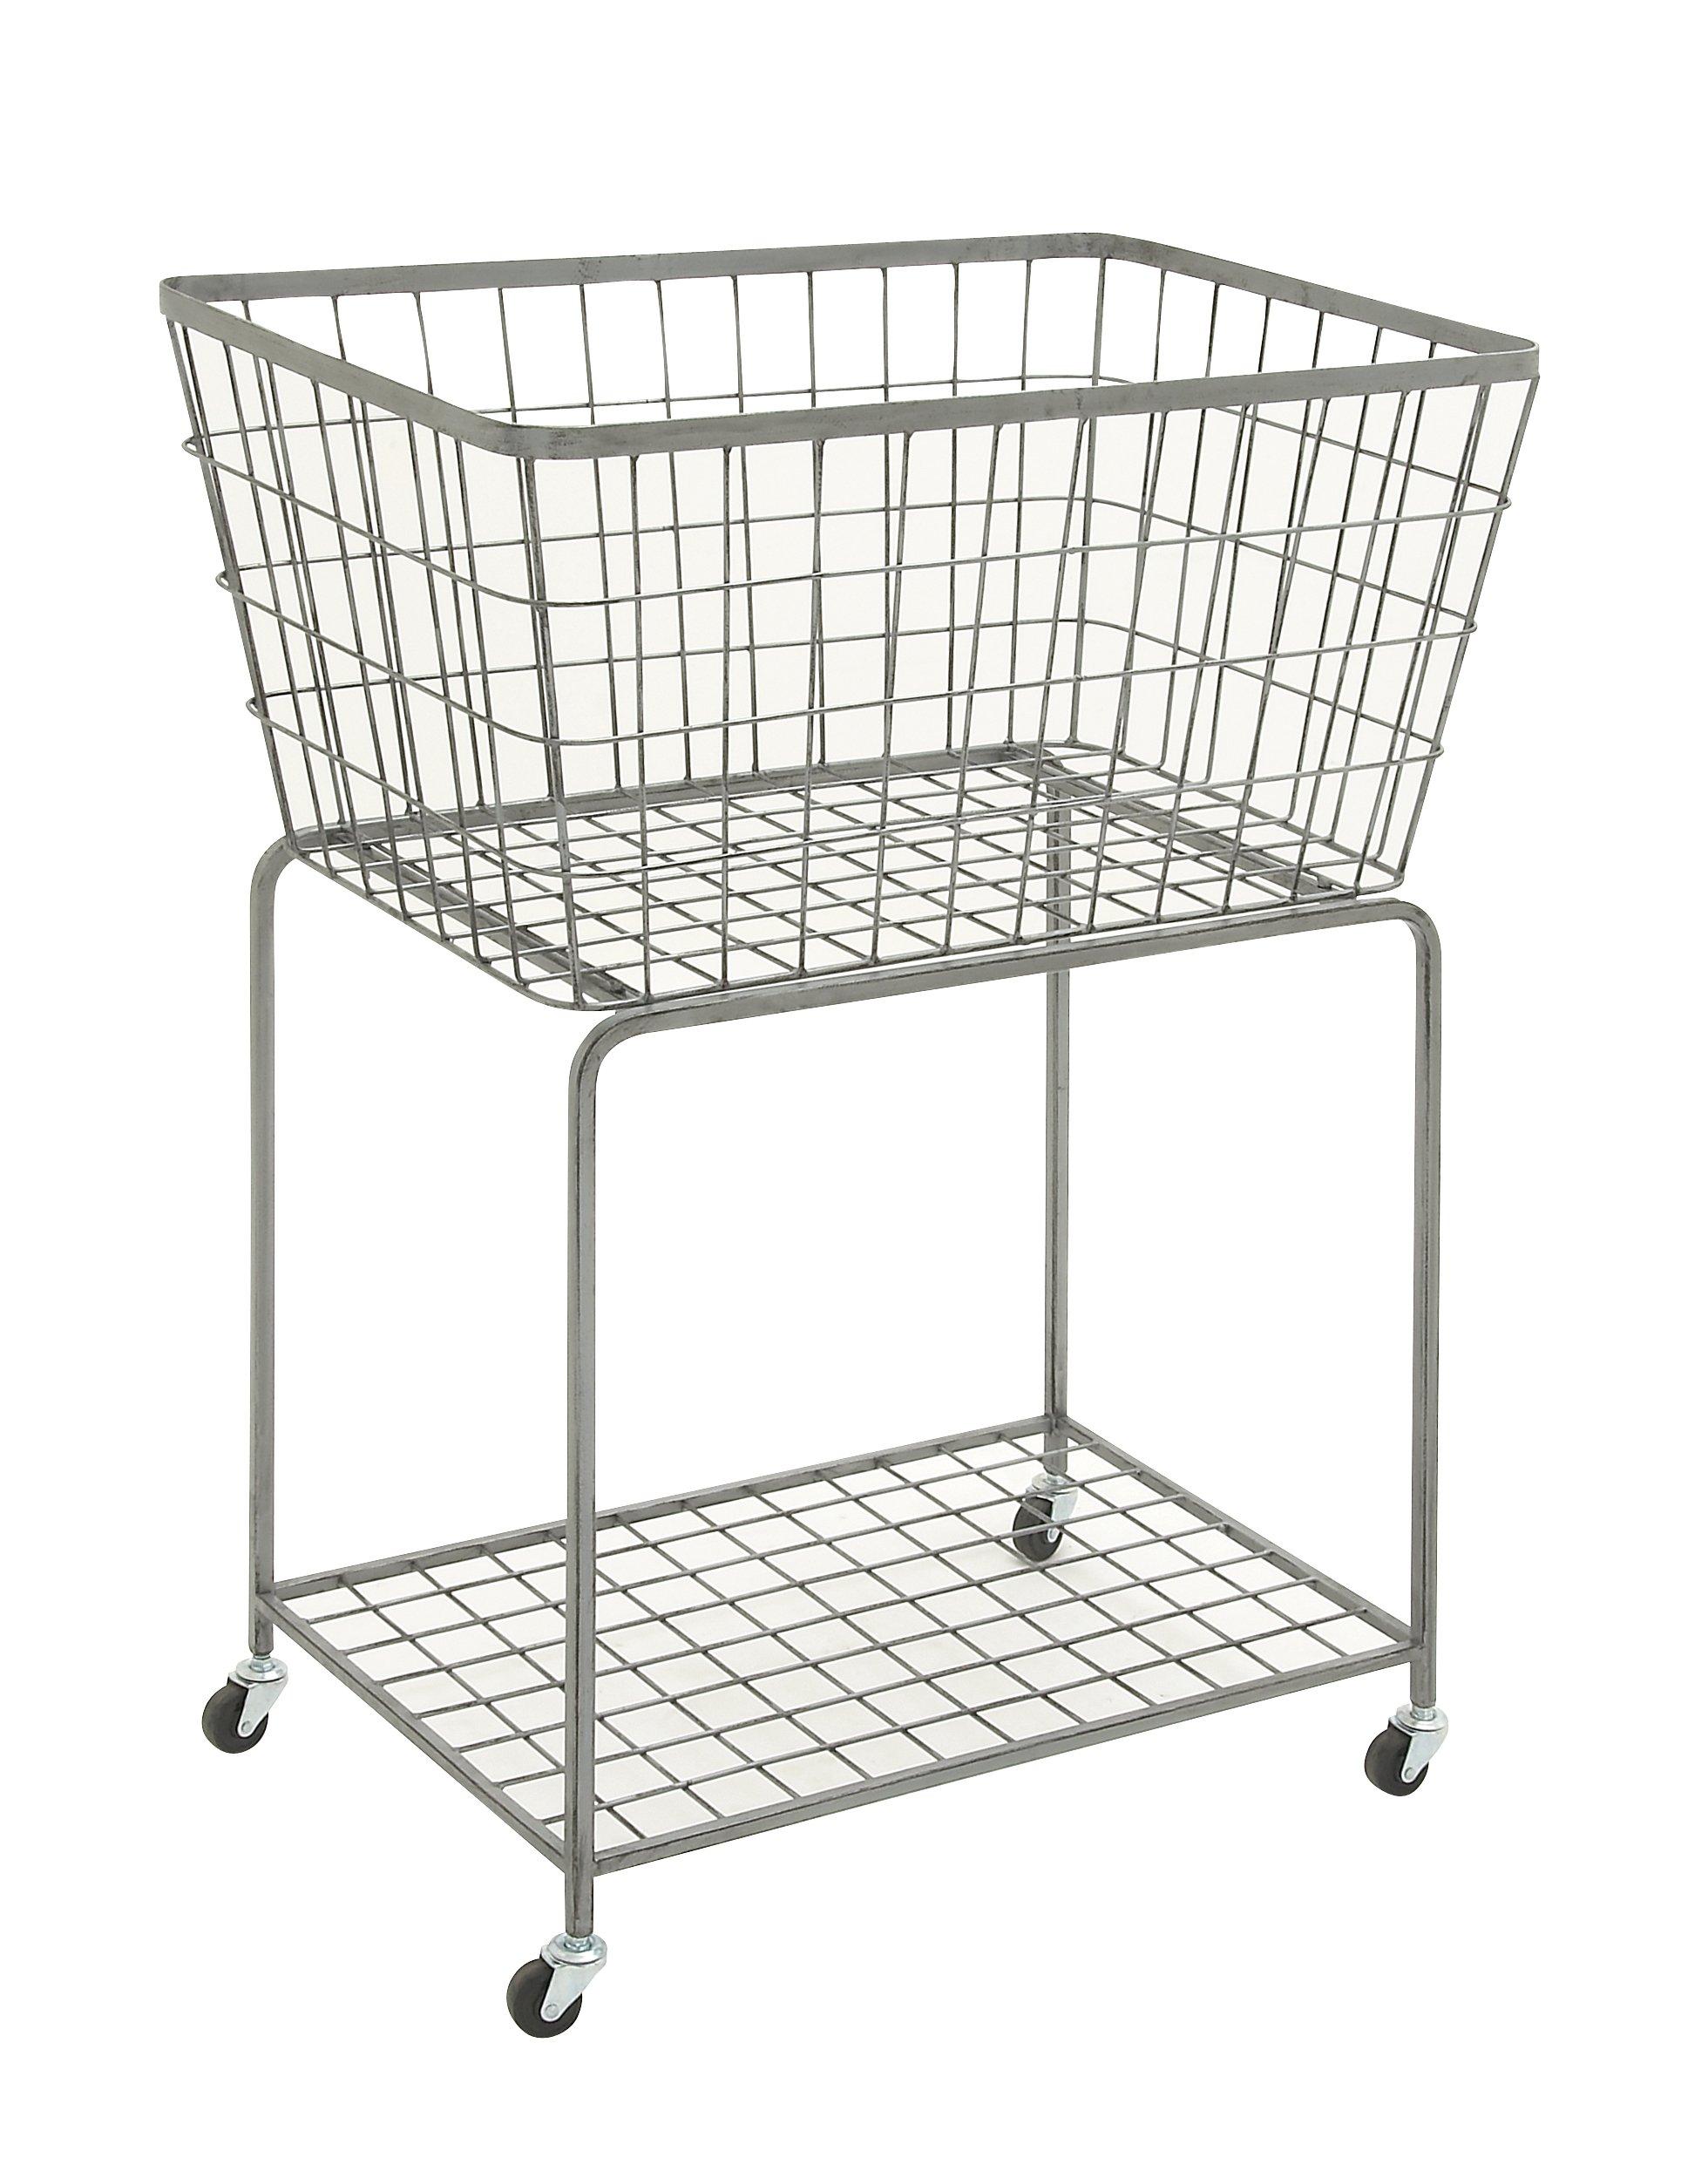 Deco 79 65440 Metal Roll Storage Basket